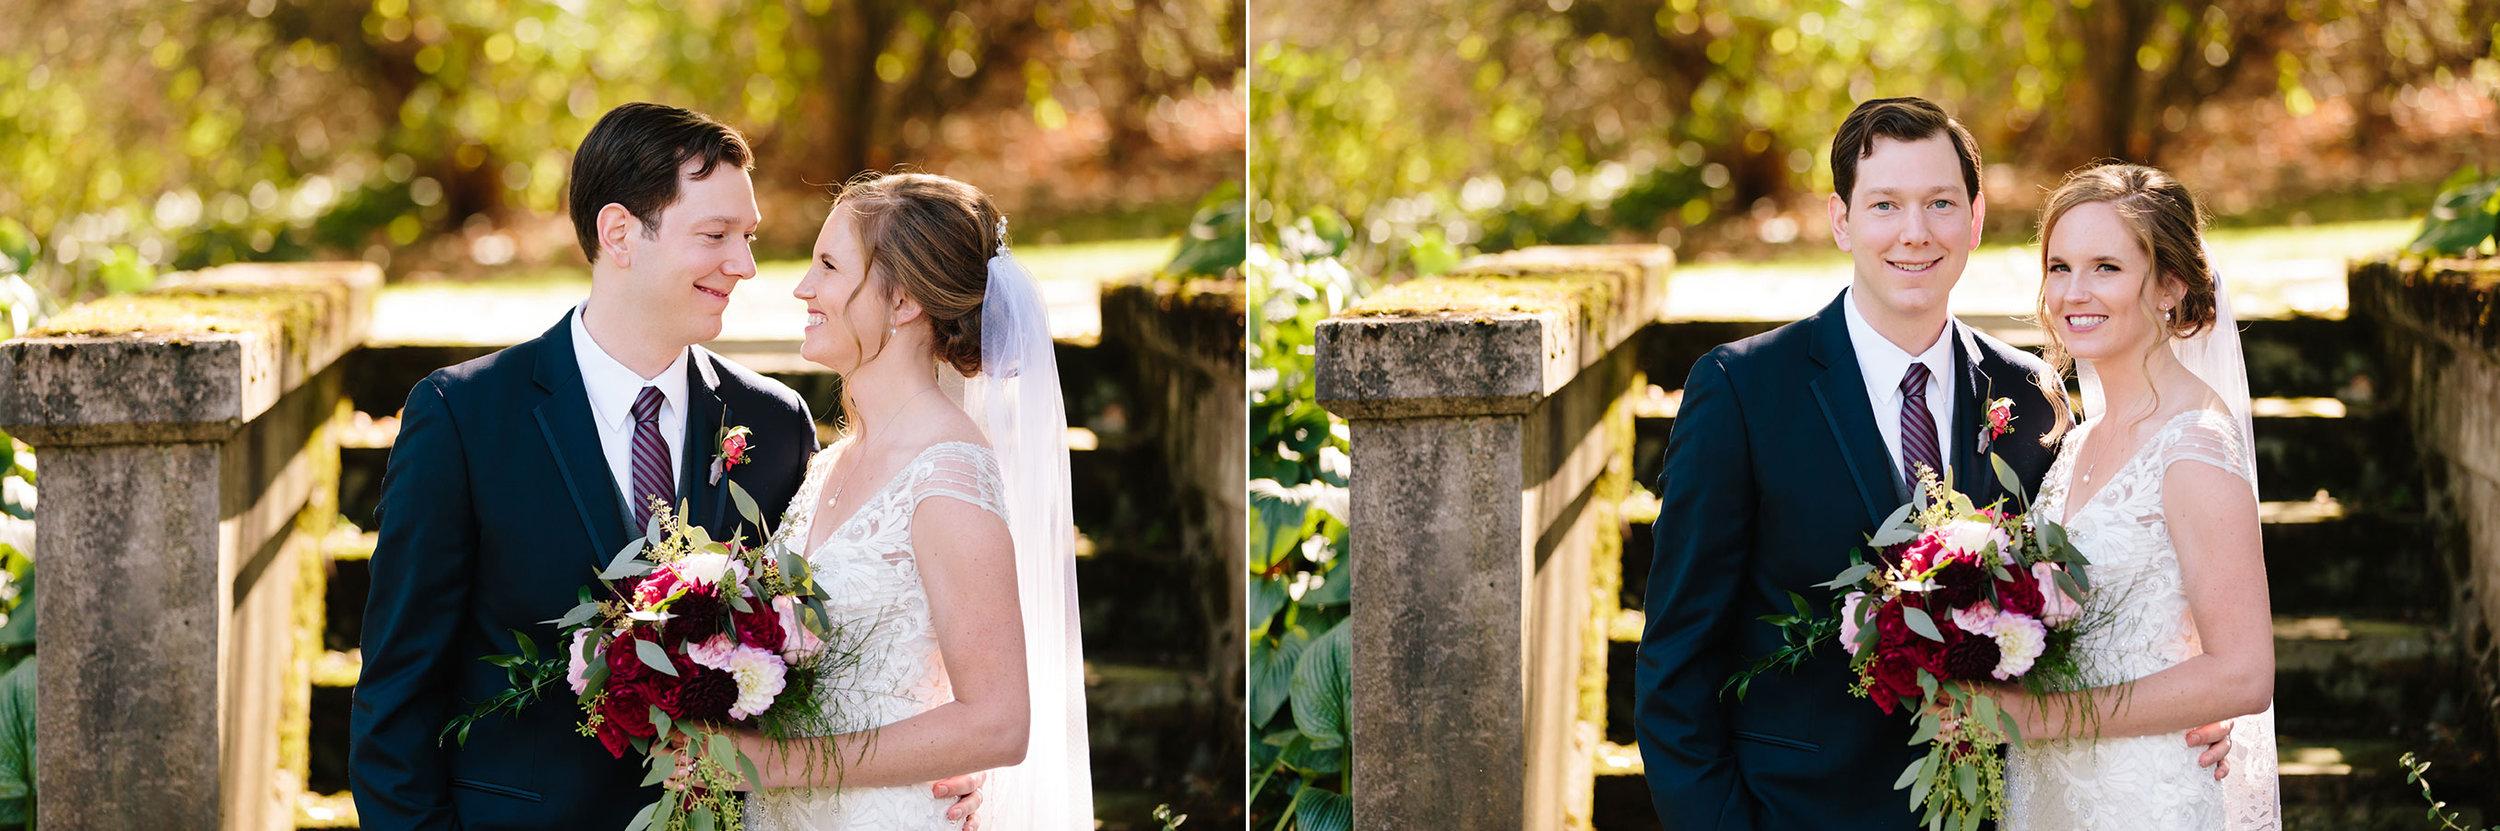 English_Inn_Wedding_032.jpg